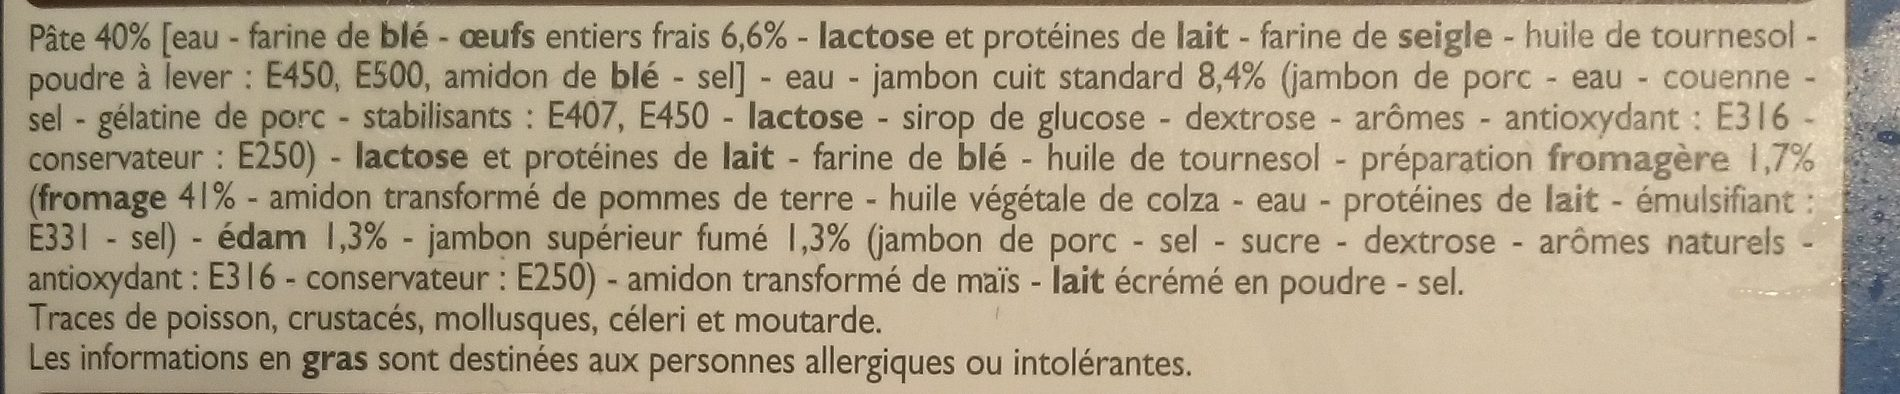 Crêpes Jambon fromage - Ingrédients - fr